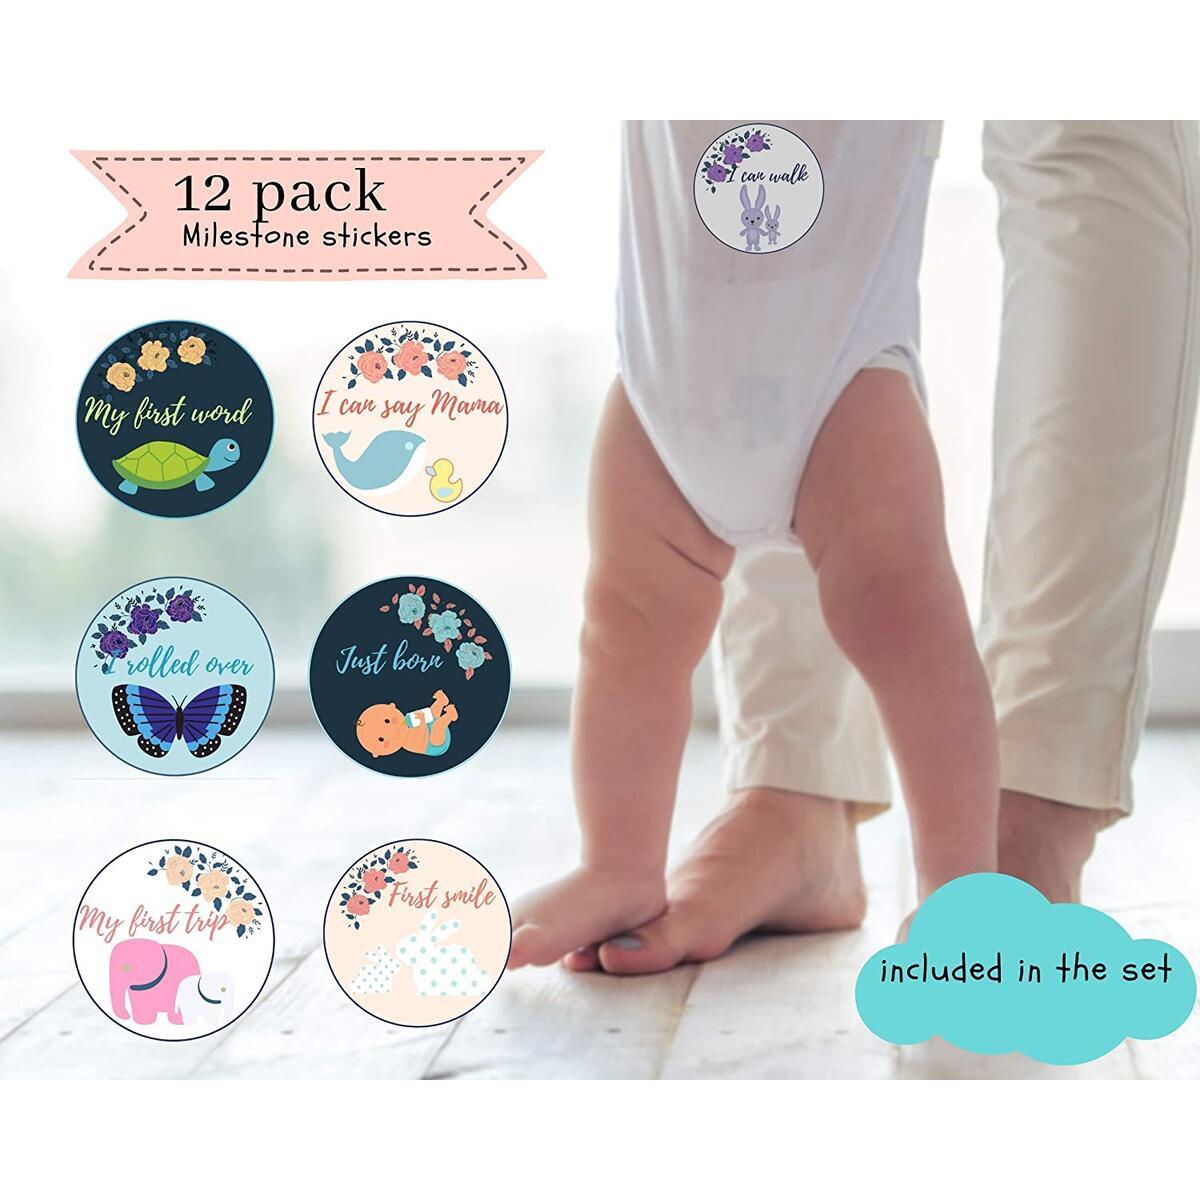 Ayala classic Baby Milestone Blanket